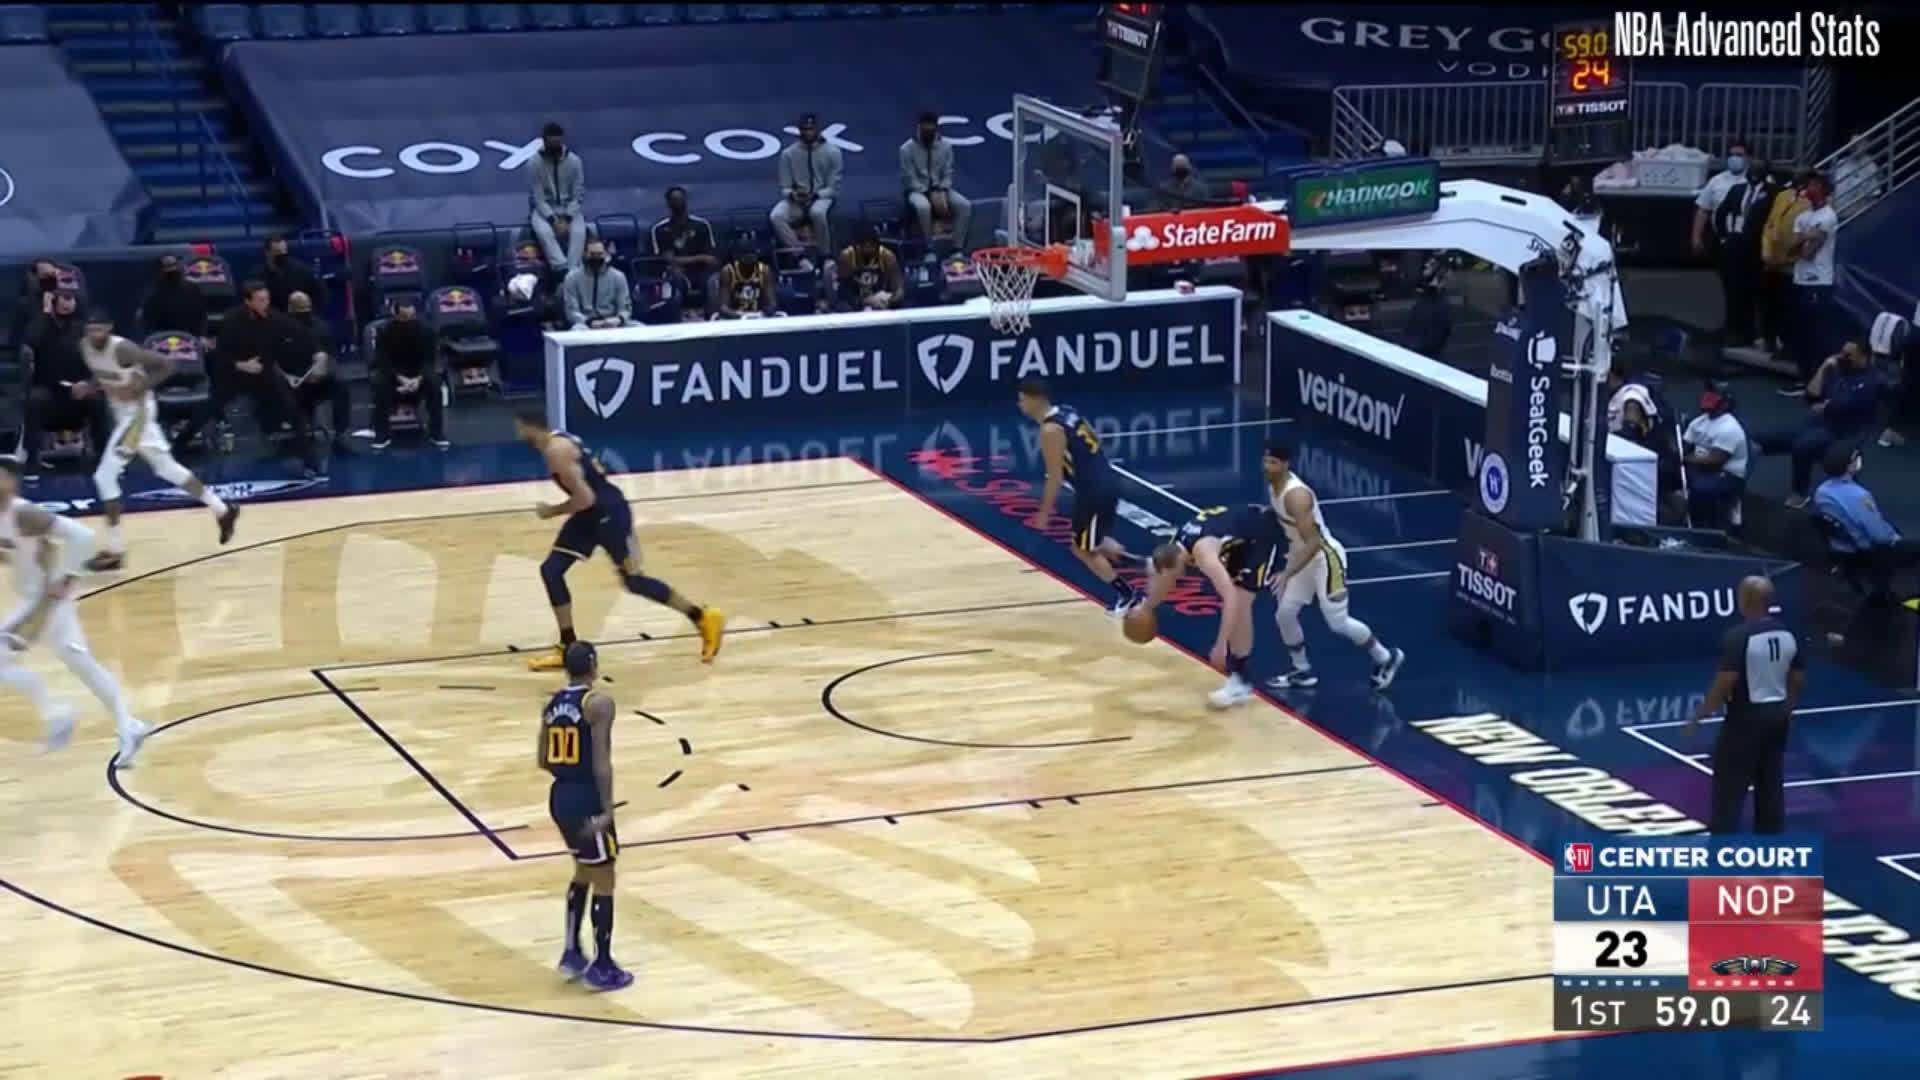 [Highlight] Josh Hart's furious rim attacks against the Jazz tonight